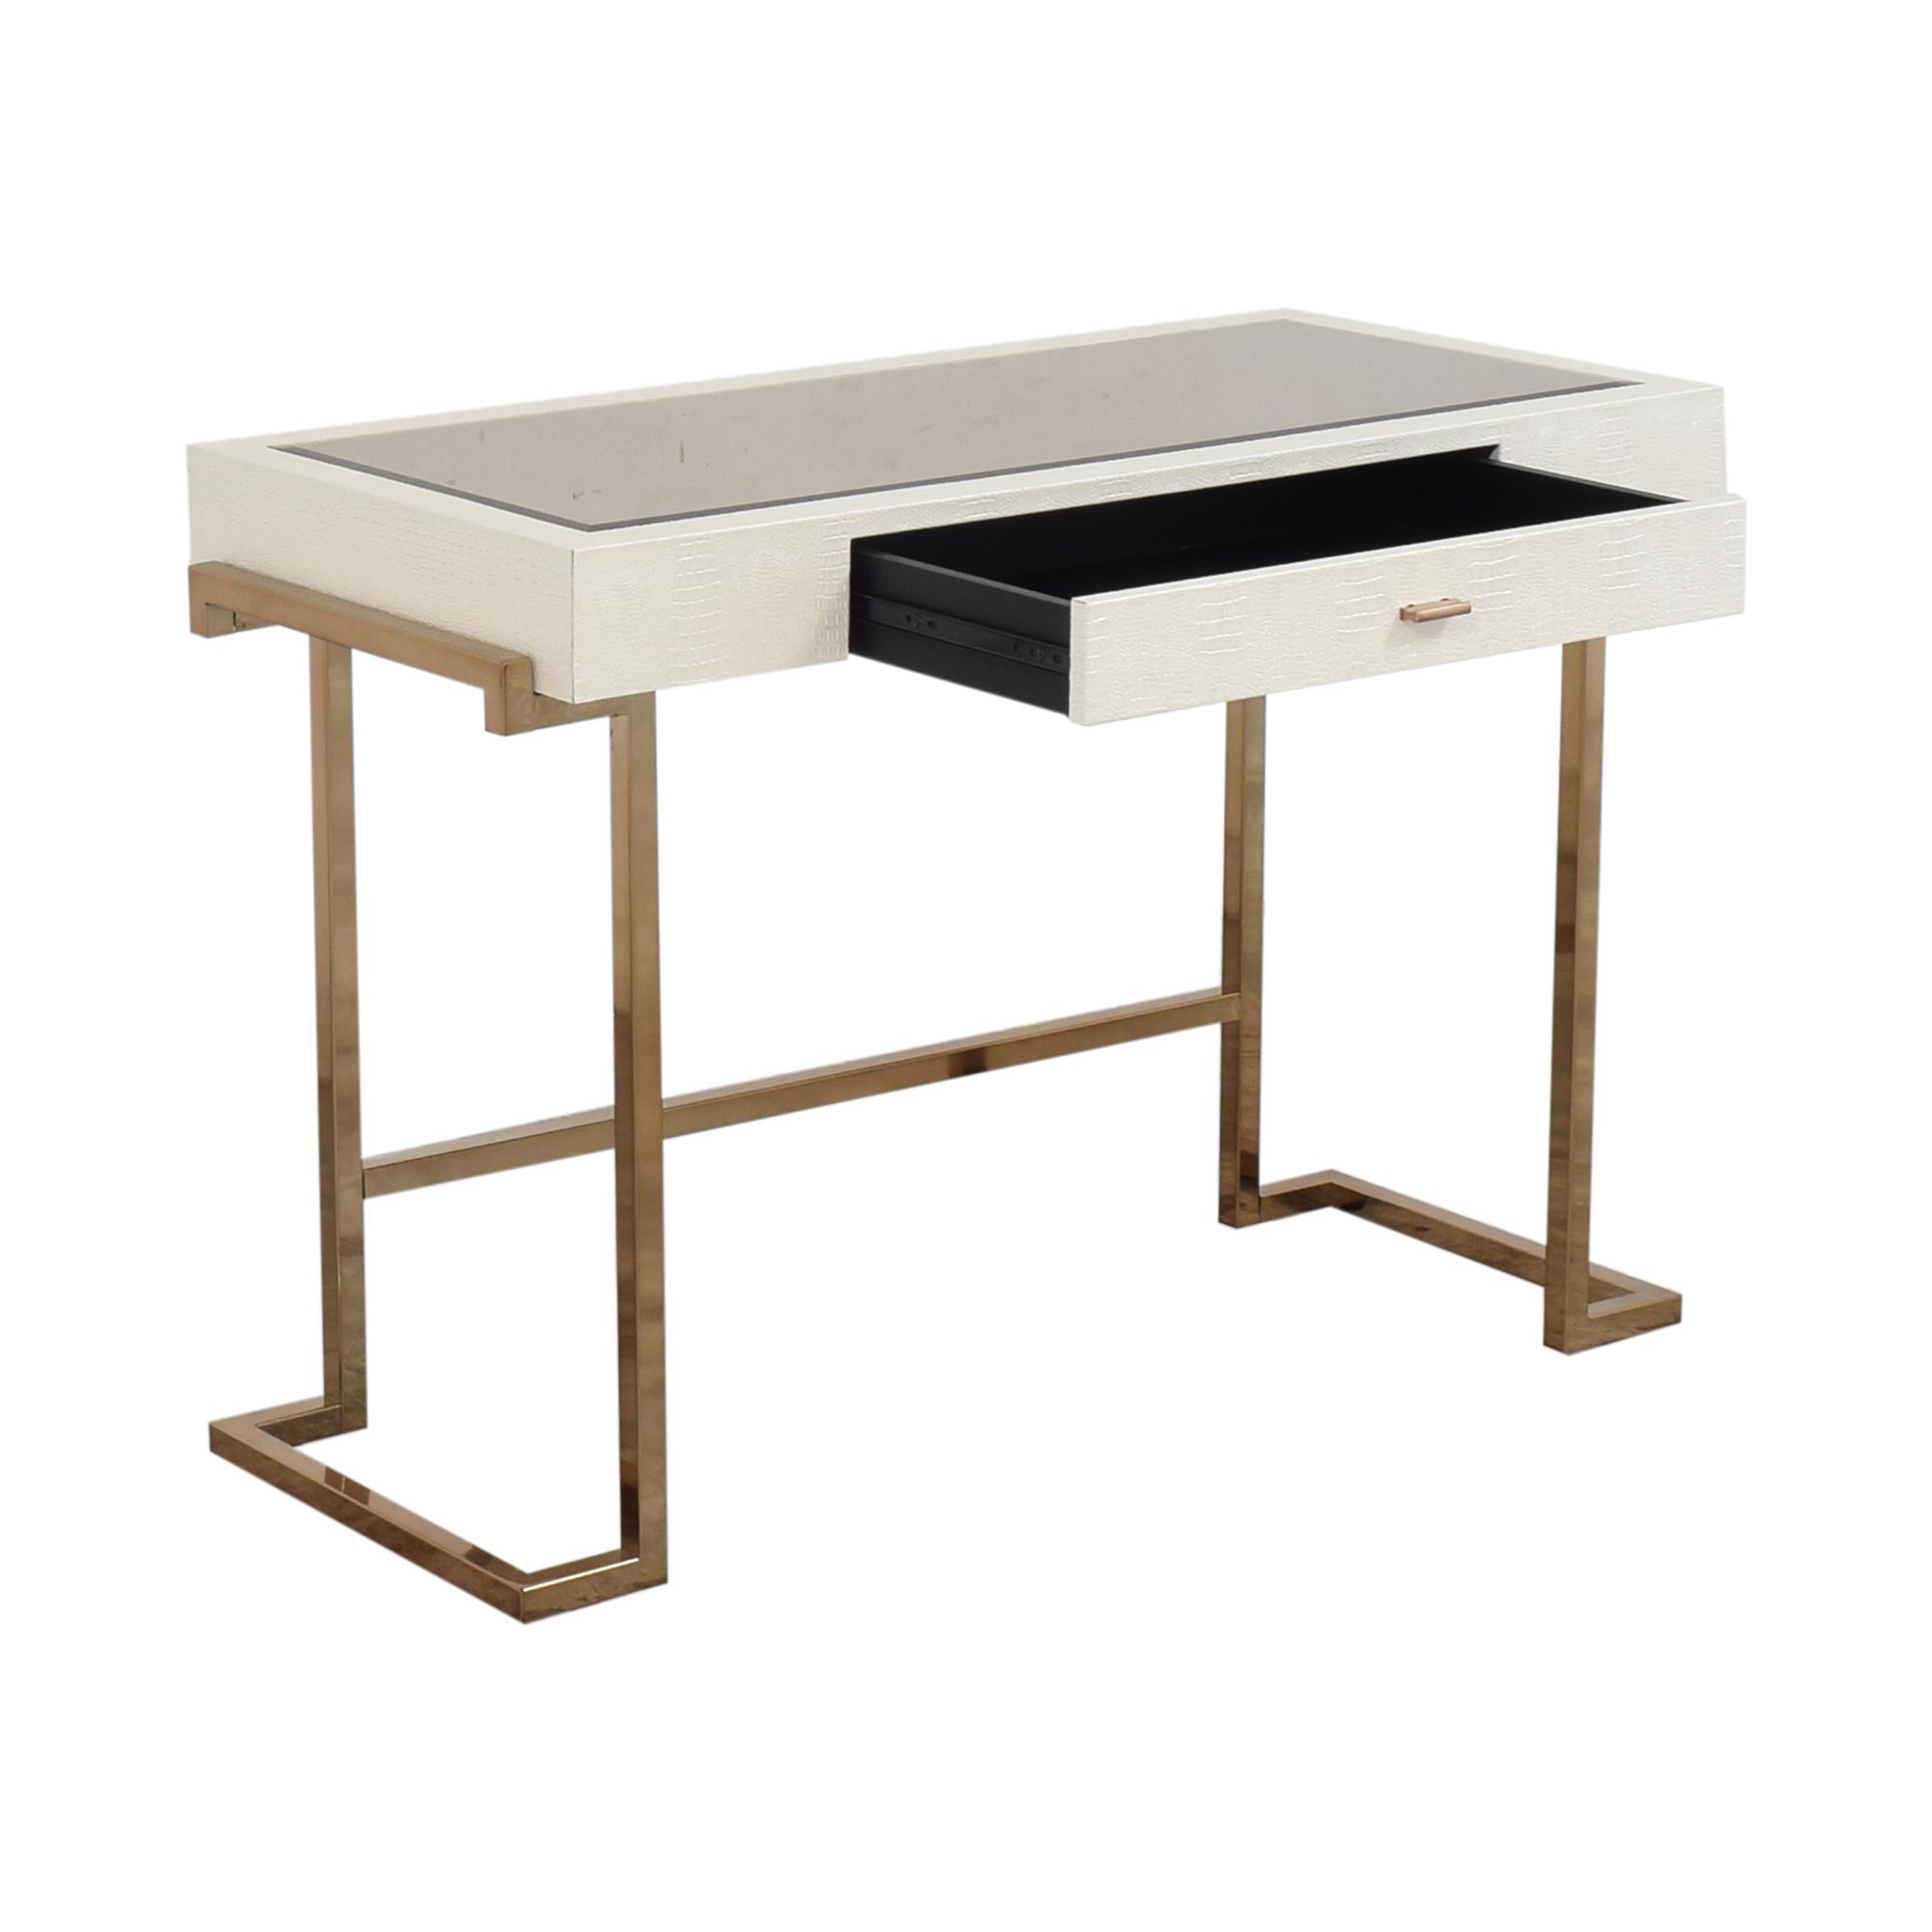 Acme Acme White Rectangular One Drawer Writing Desk dimensions